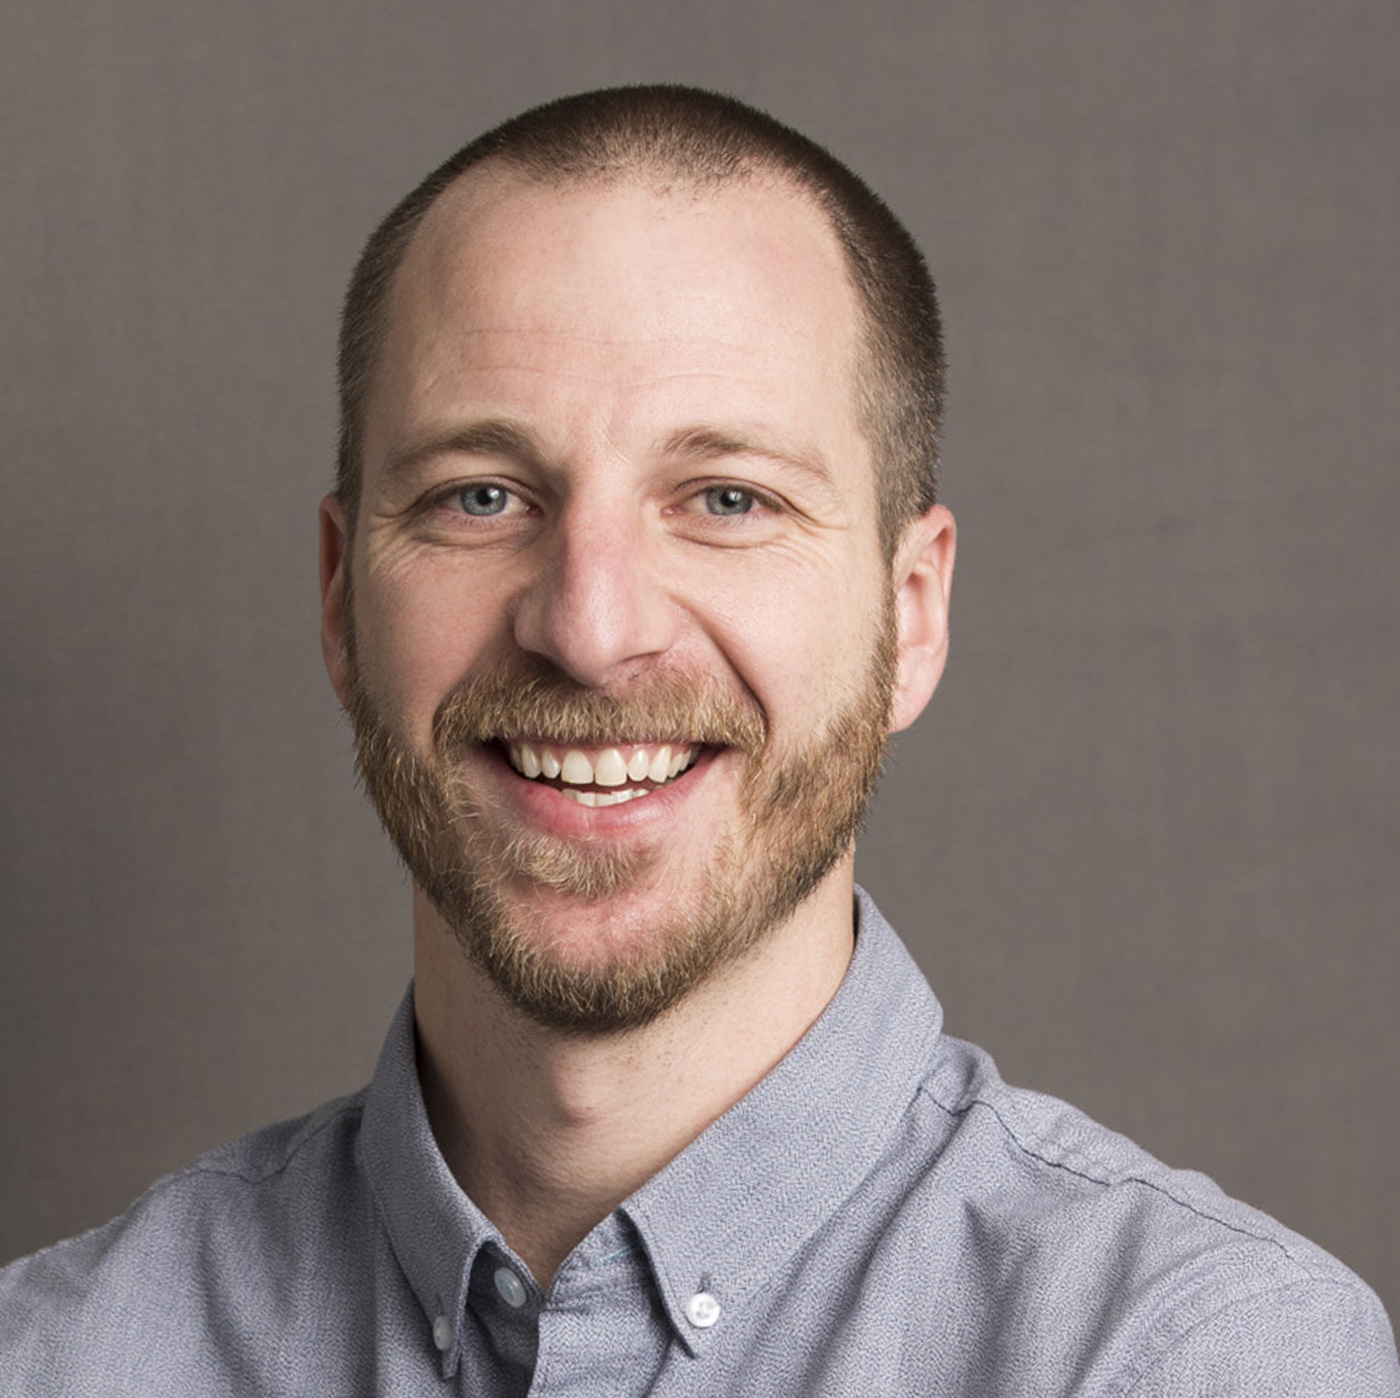 Dan Hovelson, PhD - Genome Analyst, Bioinformatician